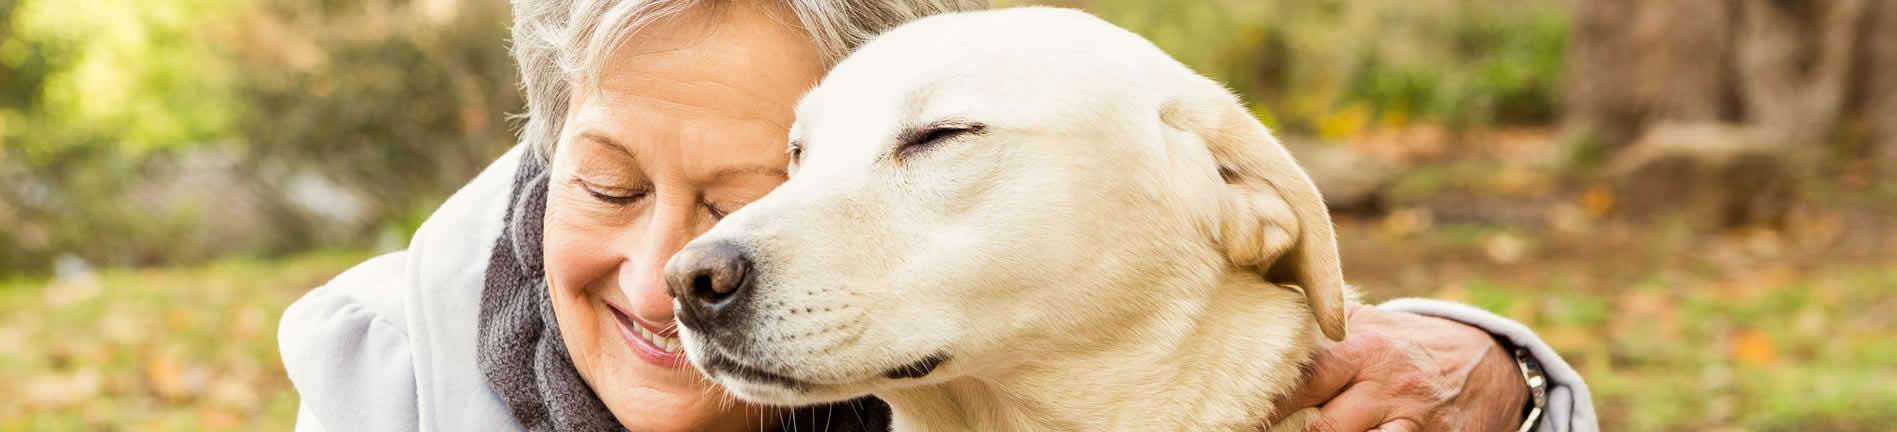 pallivet lady and dog